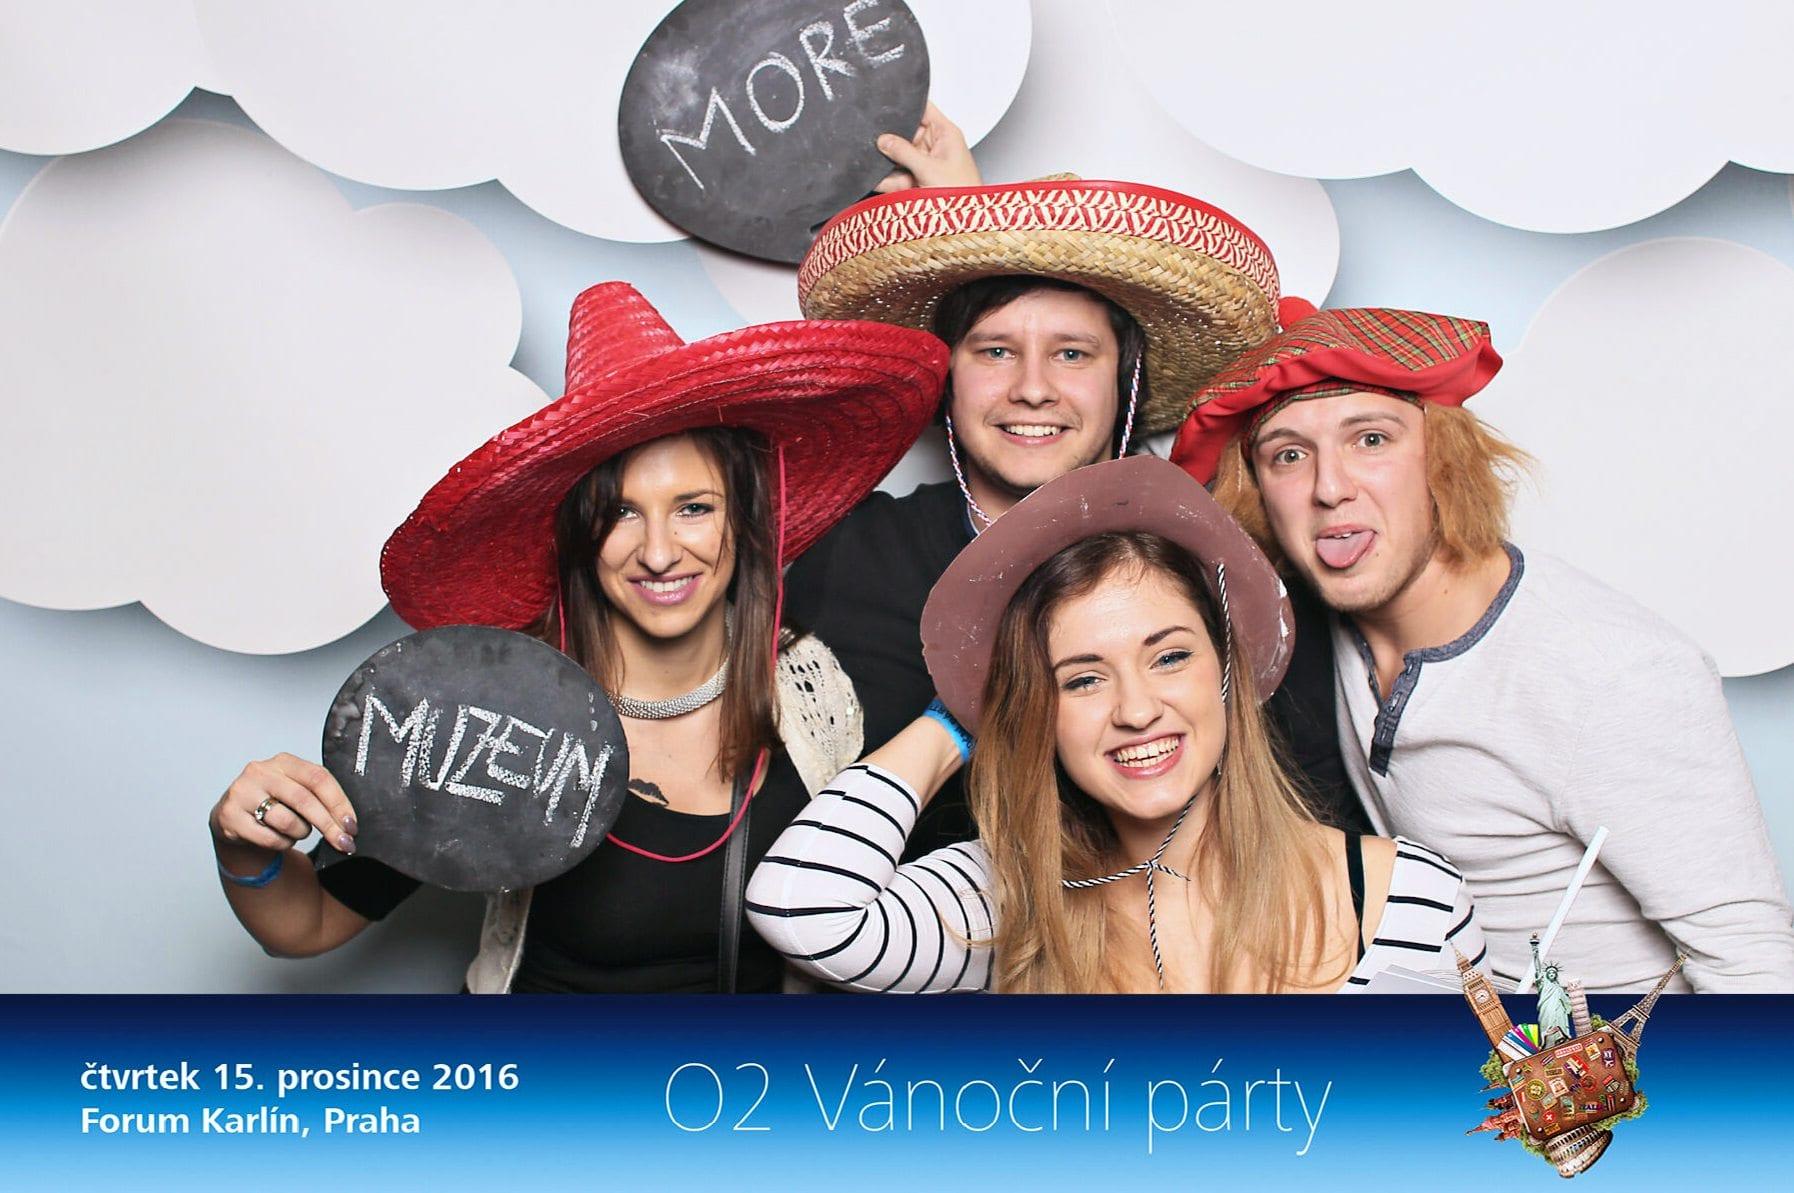 fotokoutek-02-vanocni-vecirek-cast-1-15-12-2016-187988